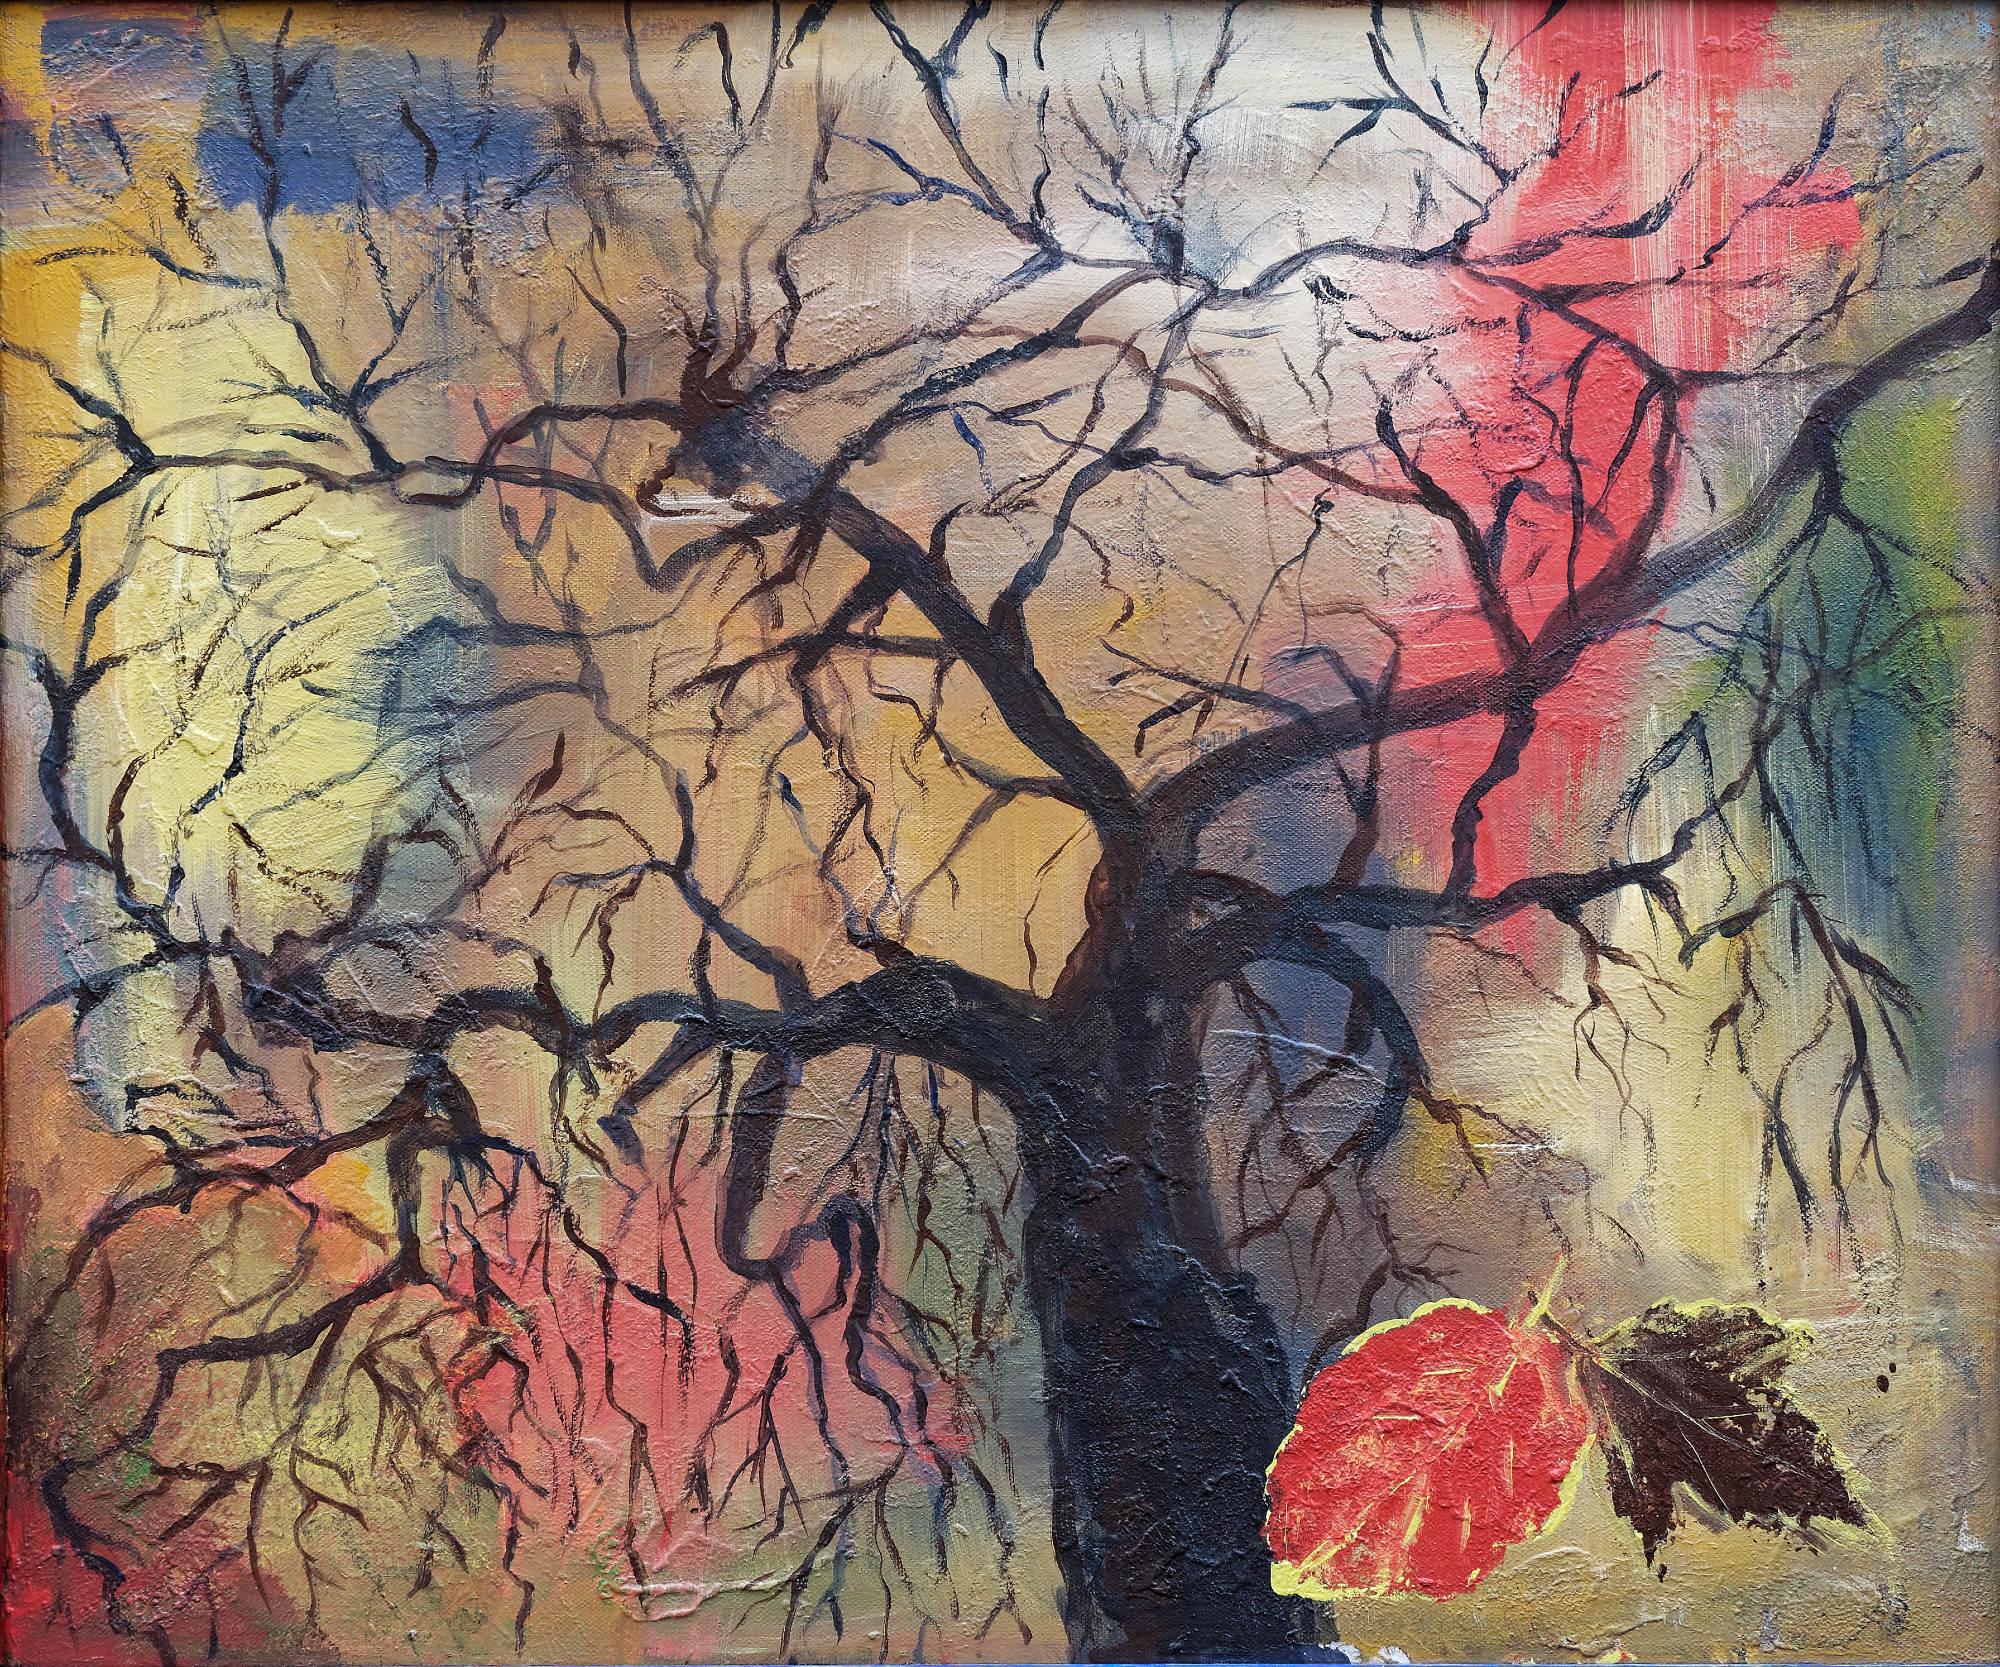 2017 - Baum im Herbst, 50x40cm, Acryl-Spachteln